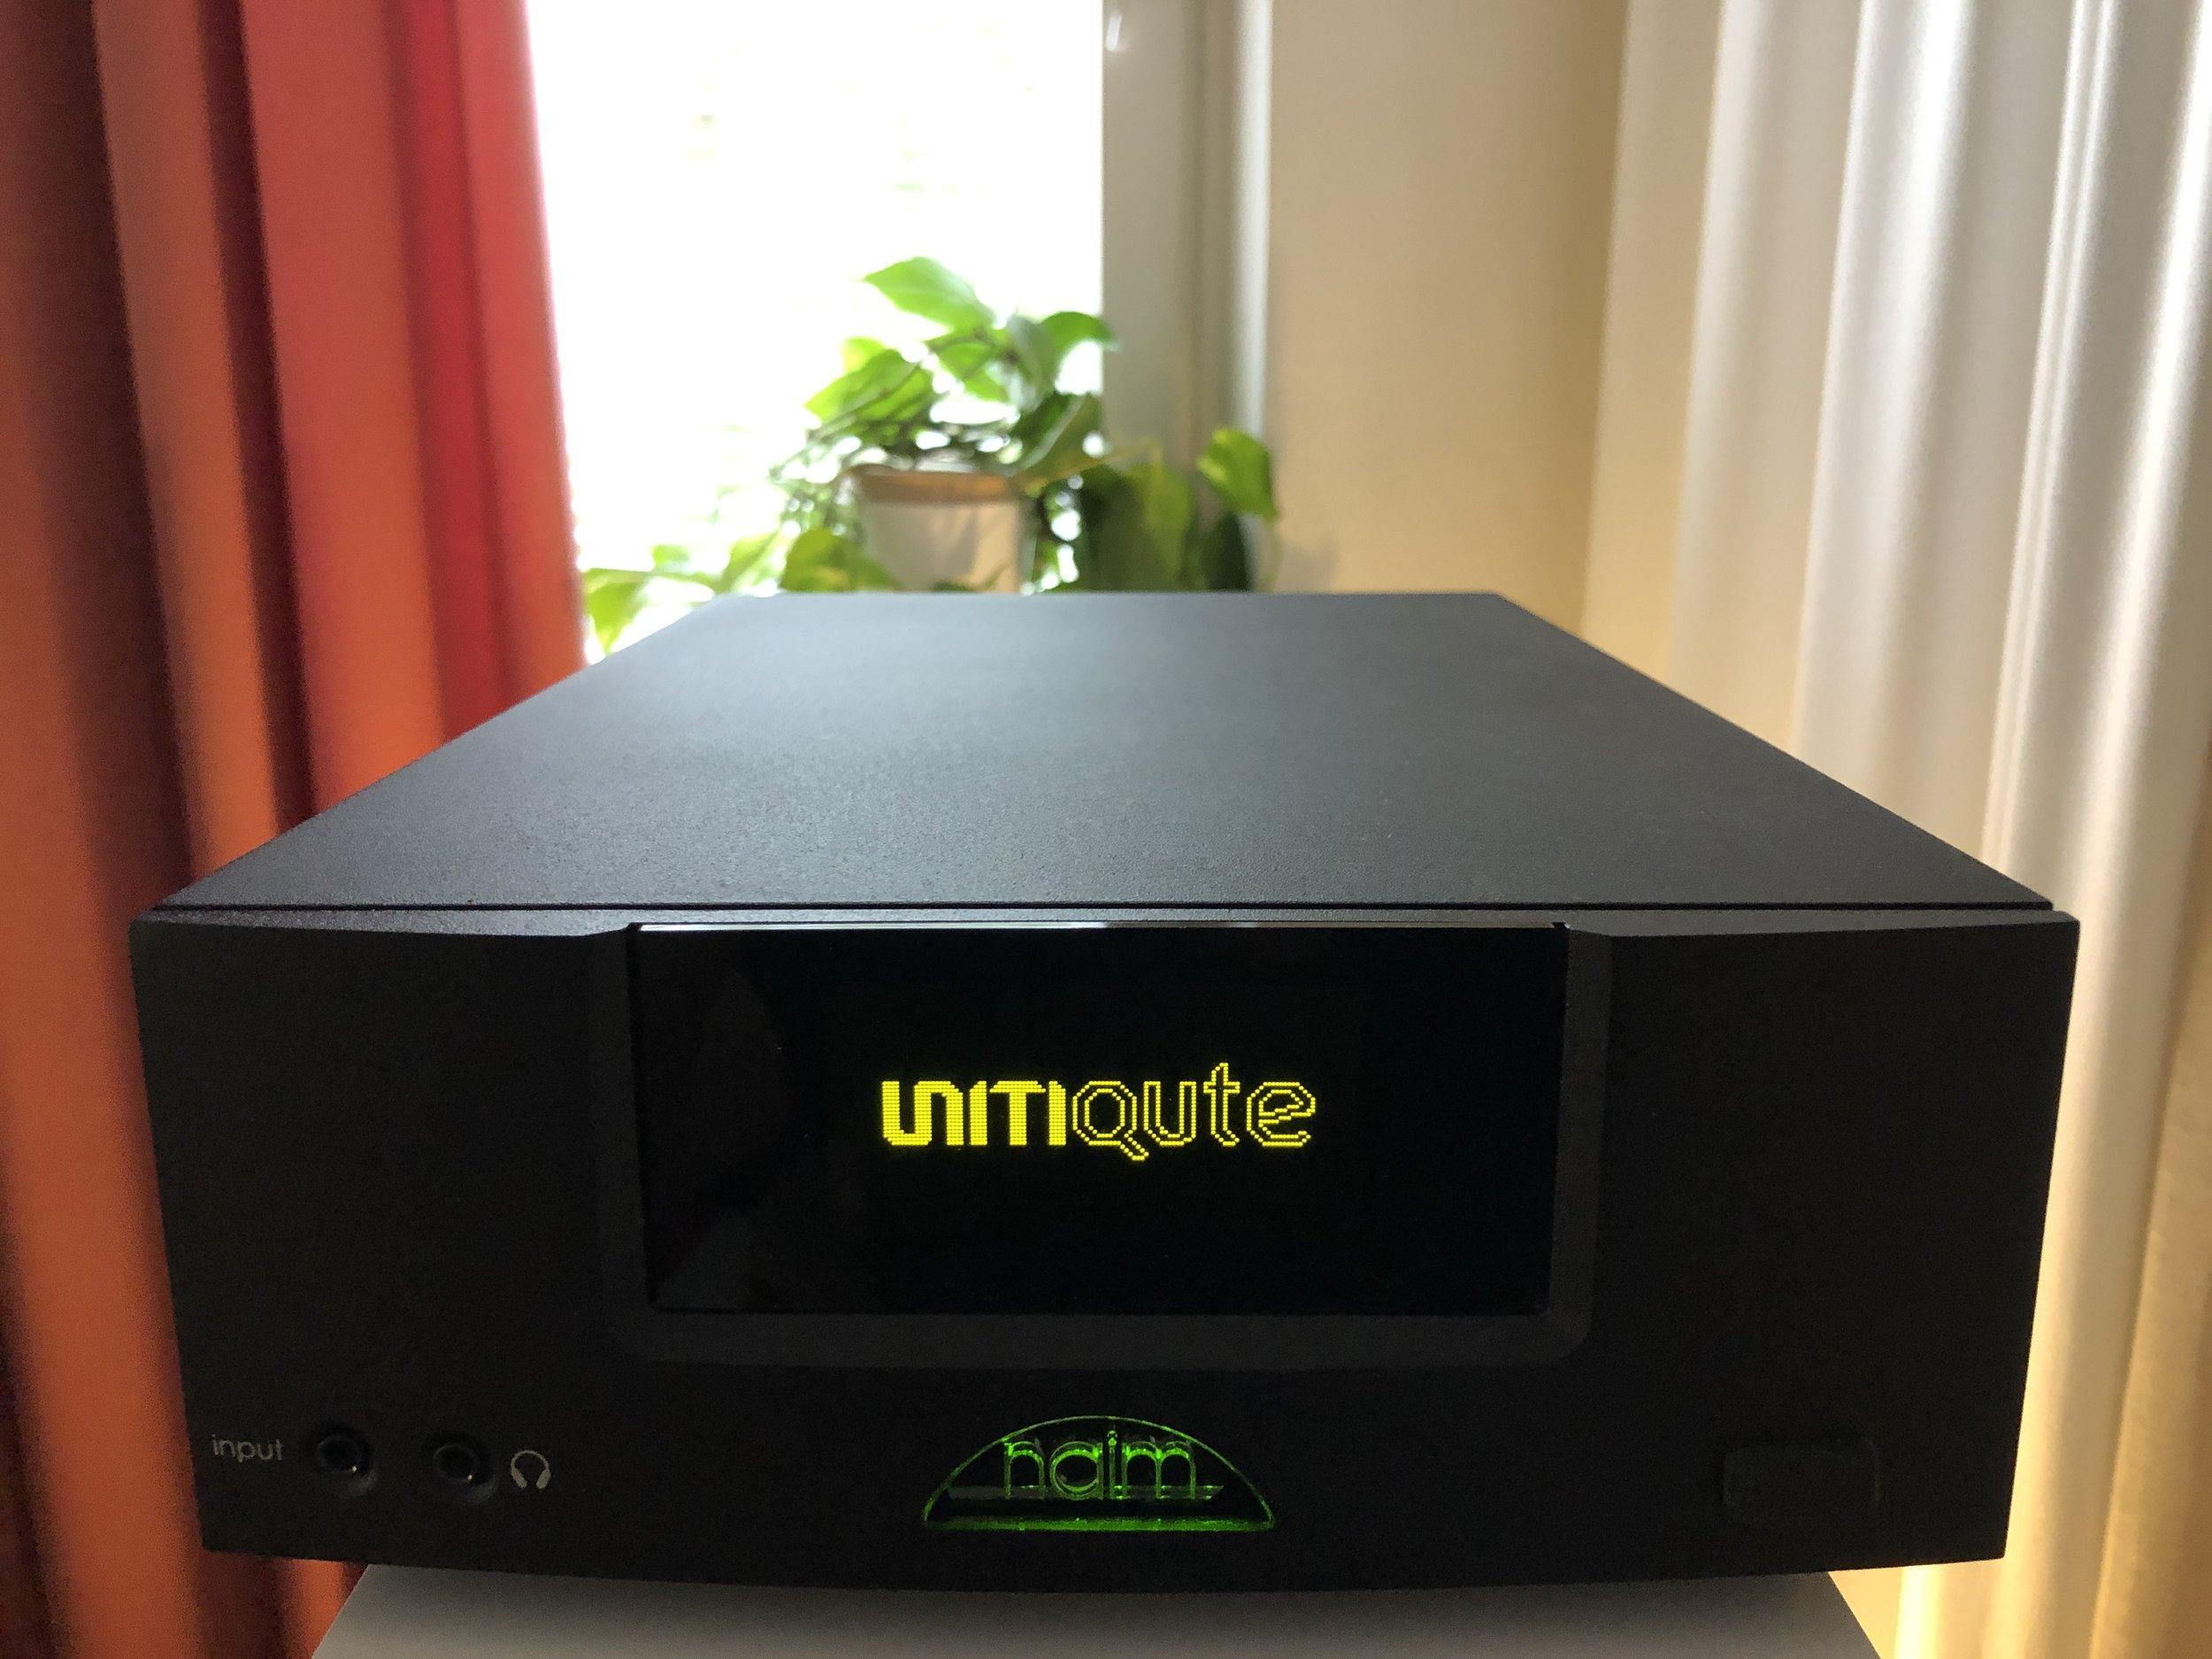 IMG_3031.JPG, naim unitiQute All-in-One Player